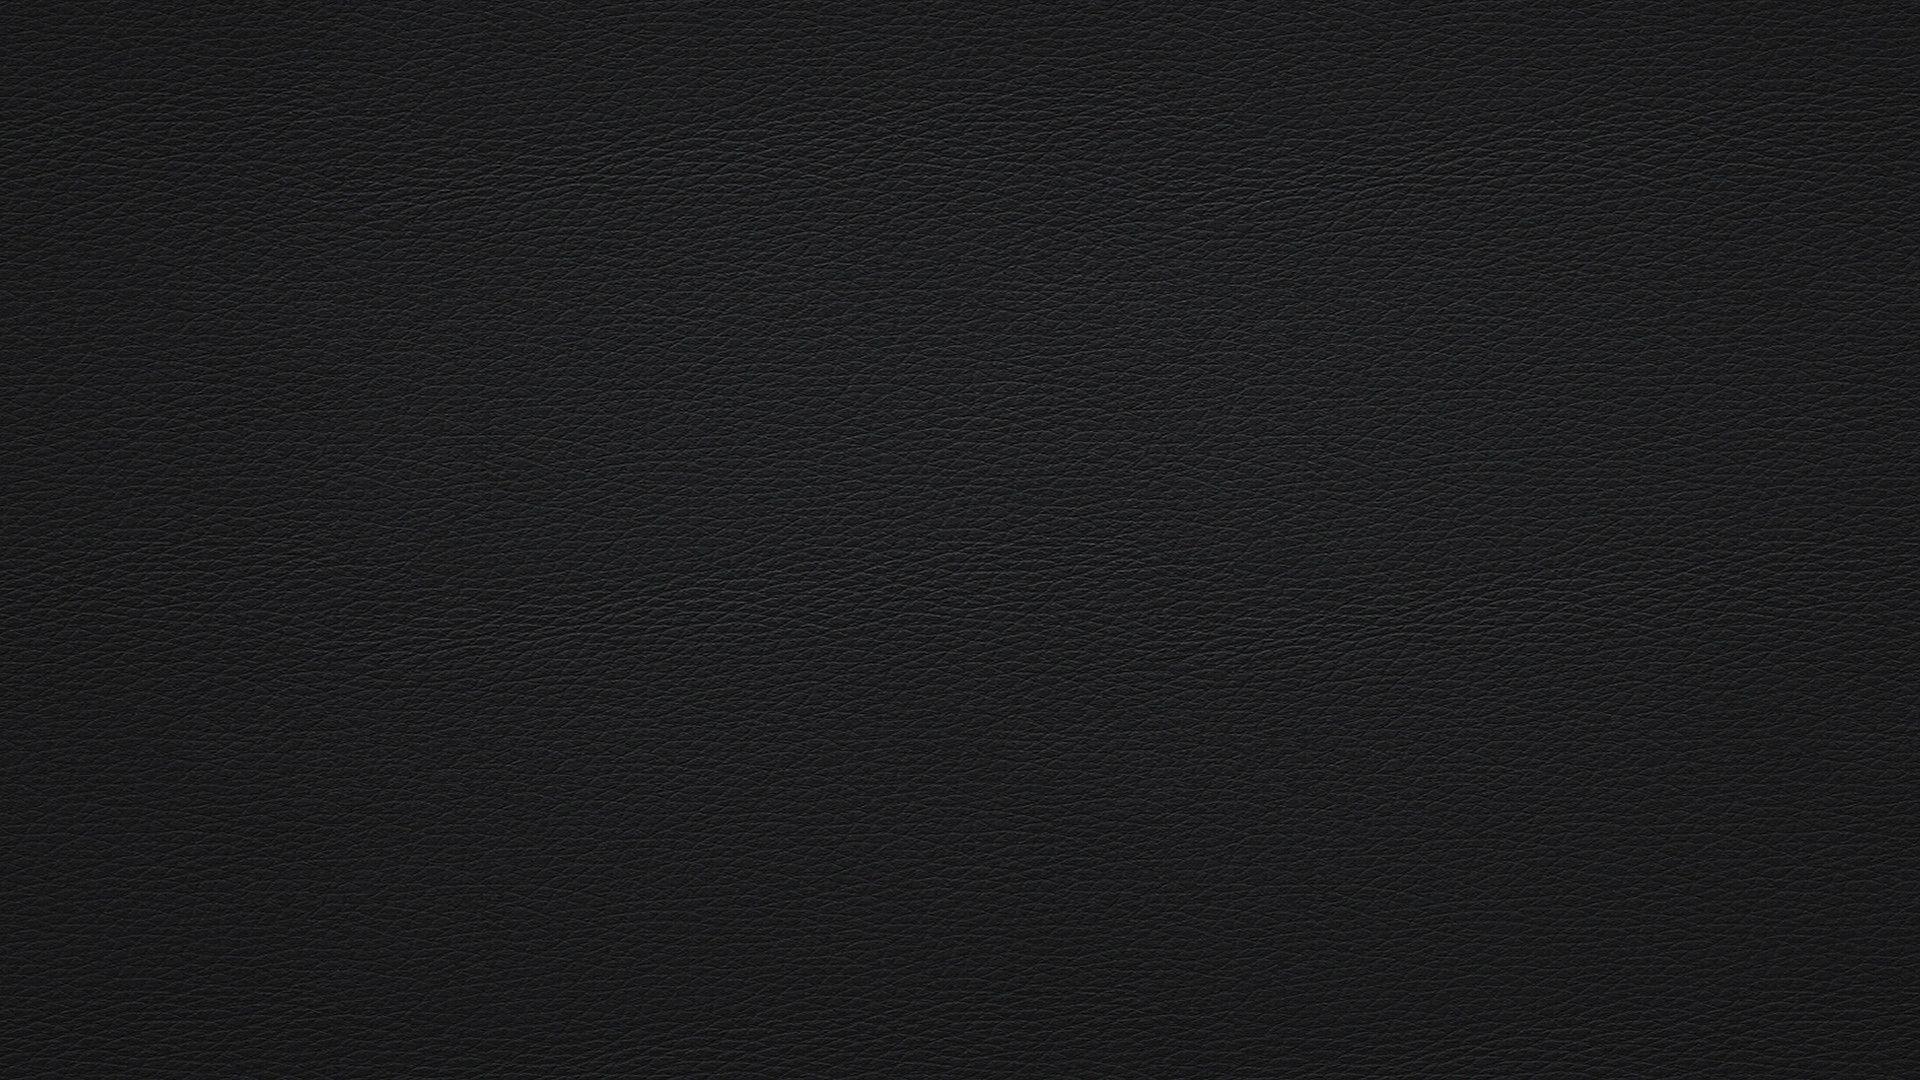 Plain Black Nice Wallpaper